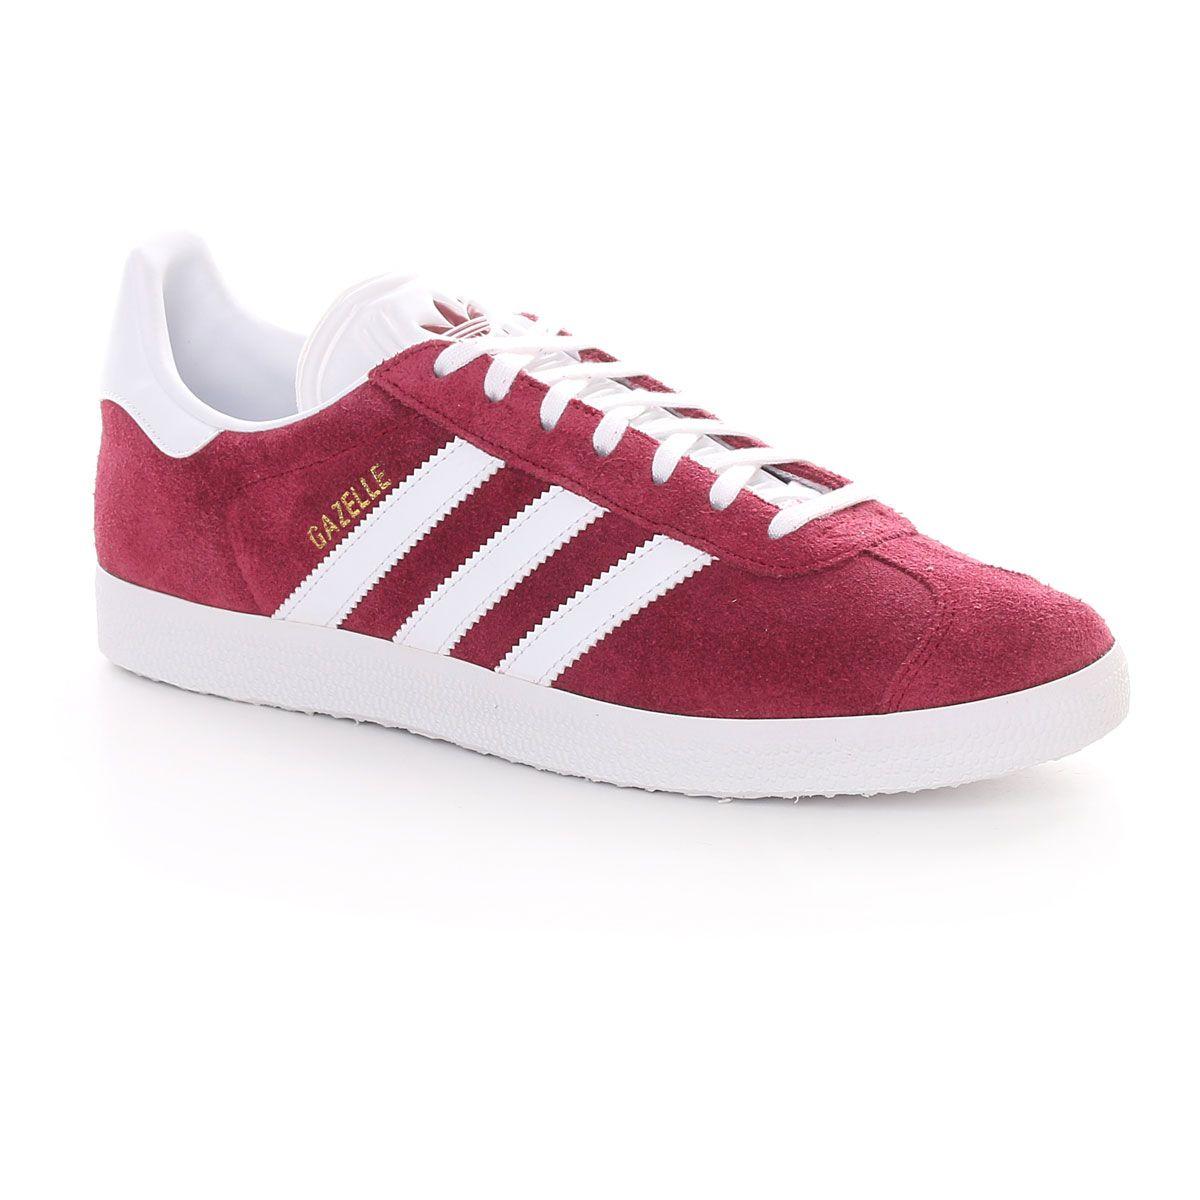 Adidas Originals Gazelle Collegiate Burgundy